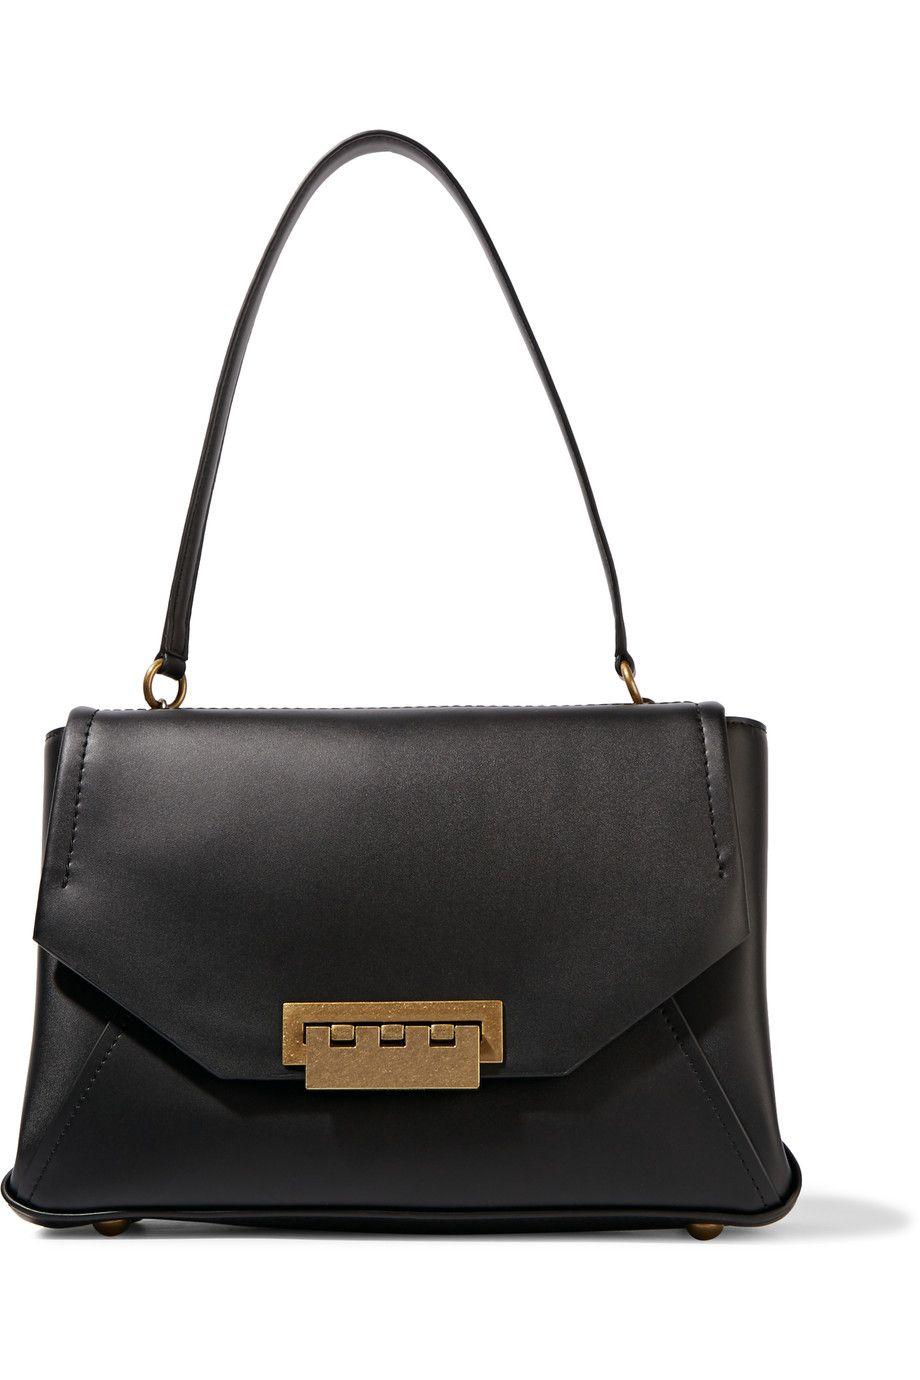 Eartha leather shoulder bag | ZAC Zac Posen | THE OUTNET